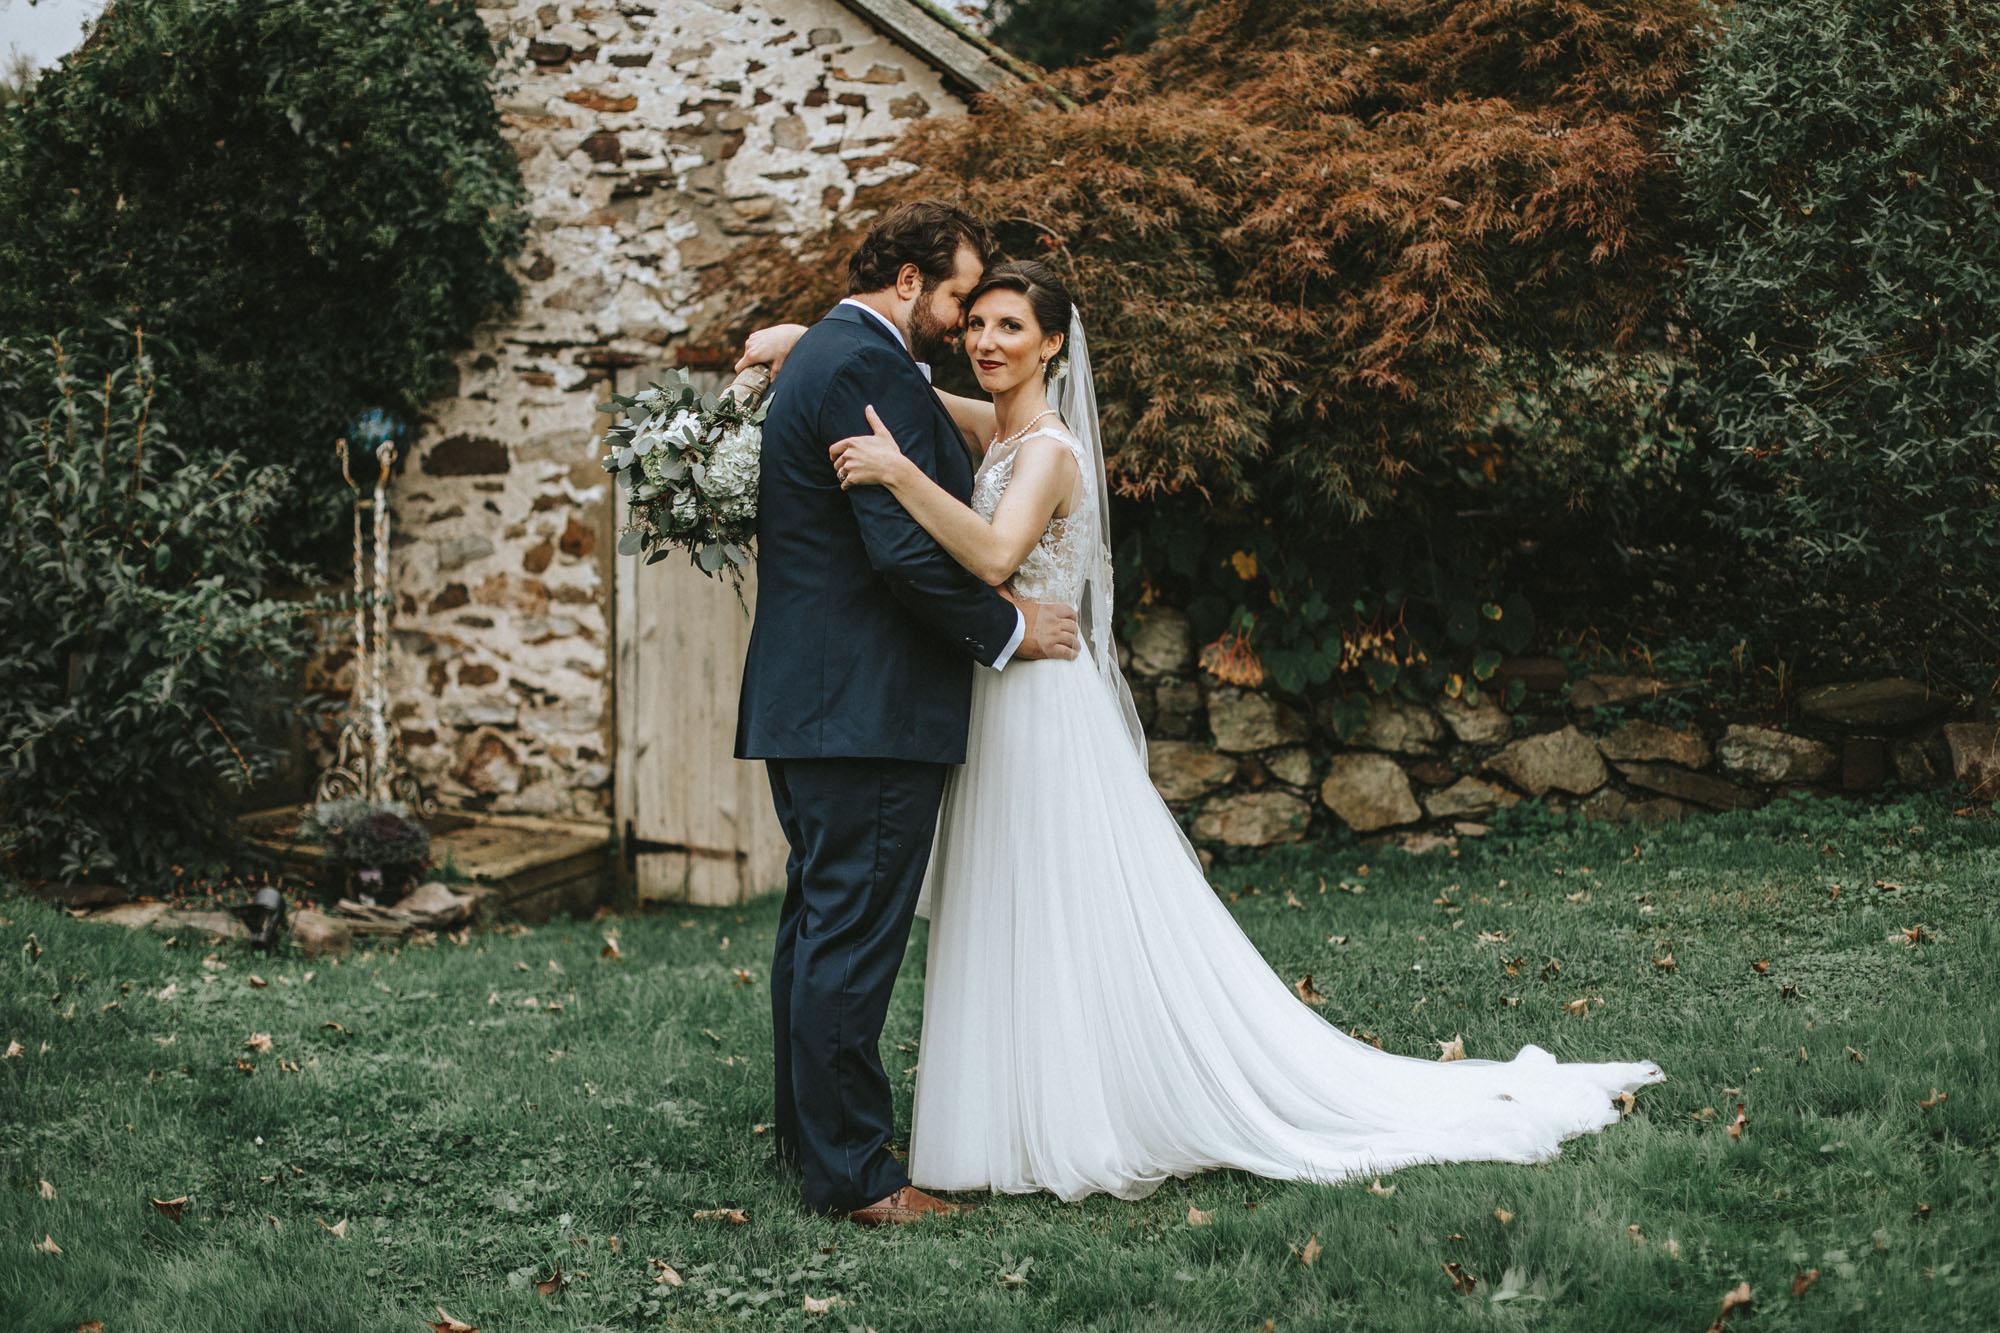 Twisted-Oaks-Studio-Arianne-Sean-Wedding-216.jpg